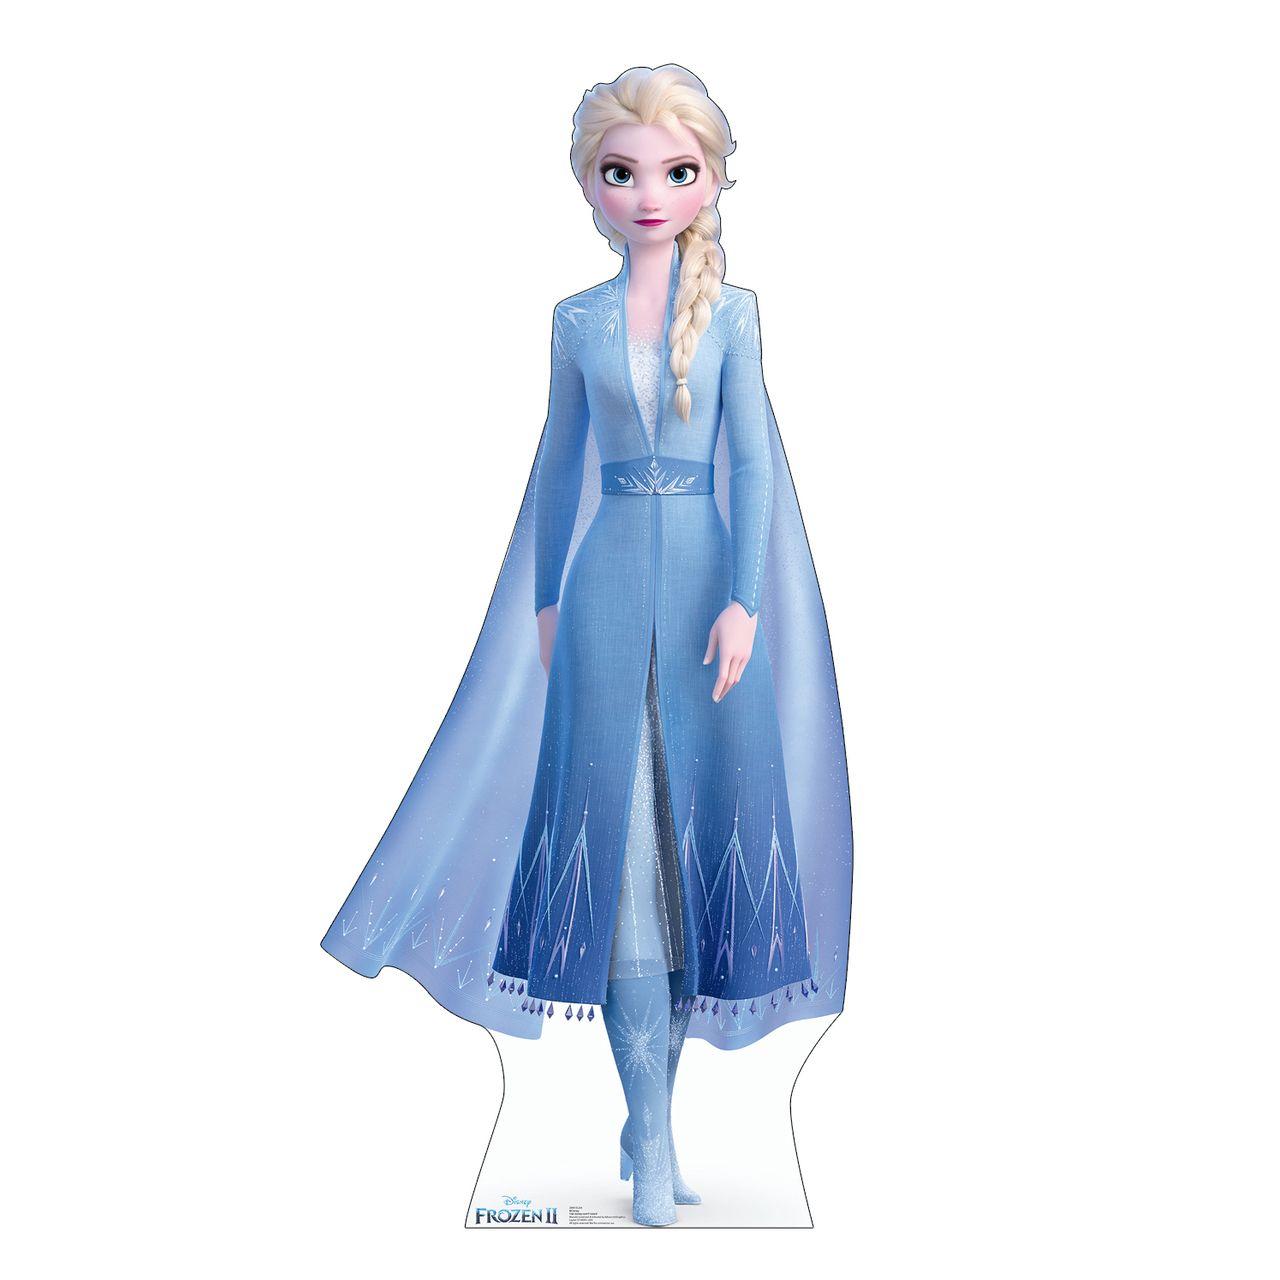 Elsa Frozen 2 Cardboard Standup Cutout Elsa Frozen Disney Princess Frozen Disney Frozen Elsa